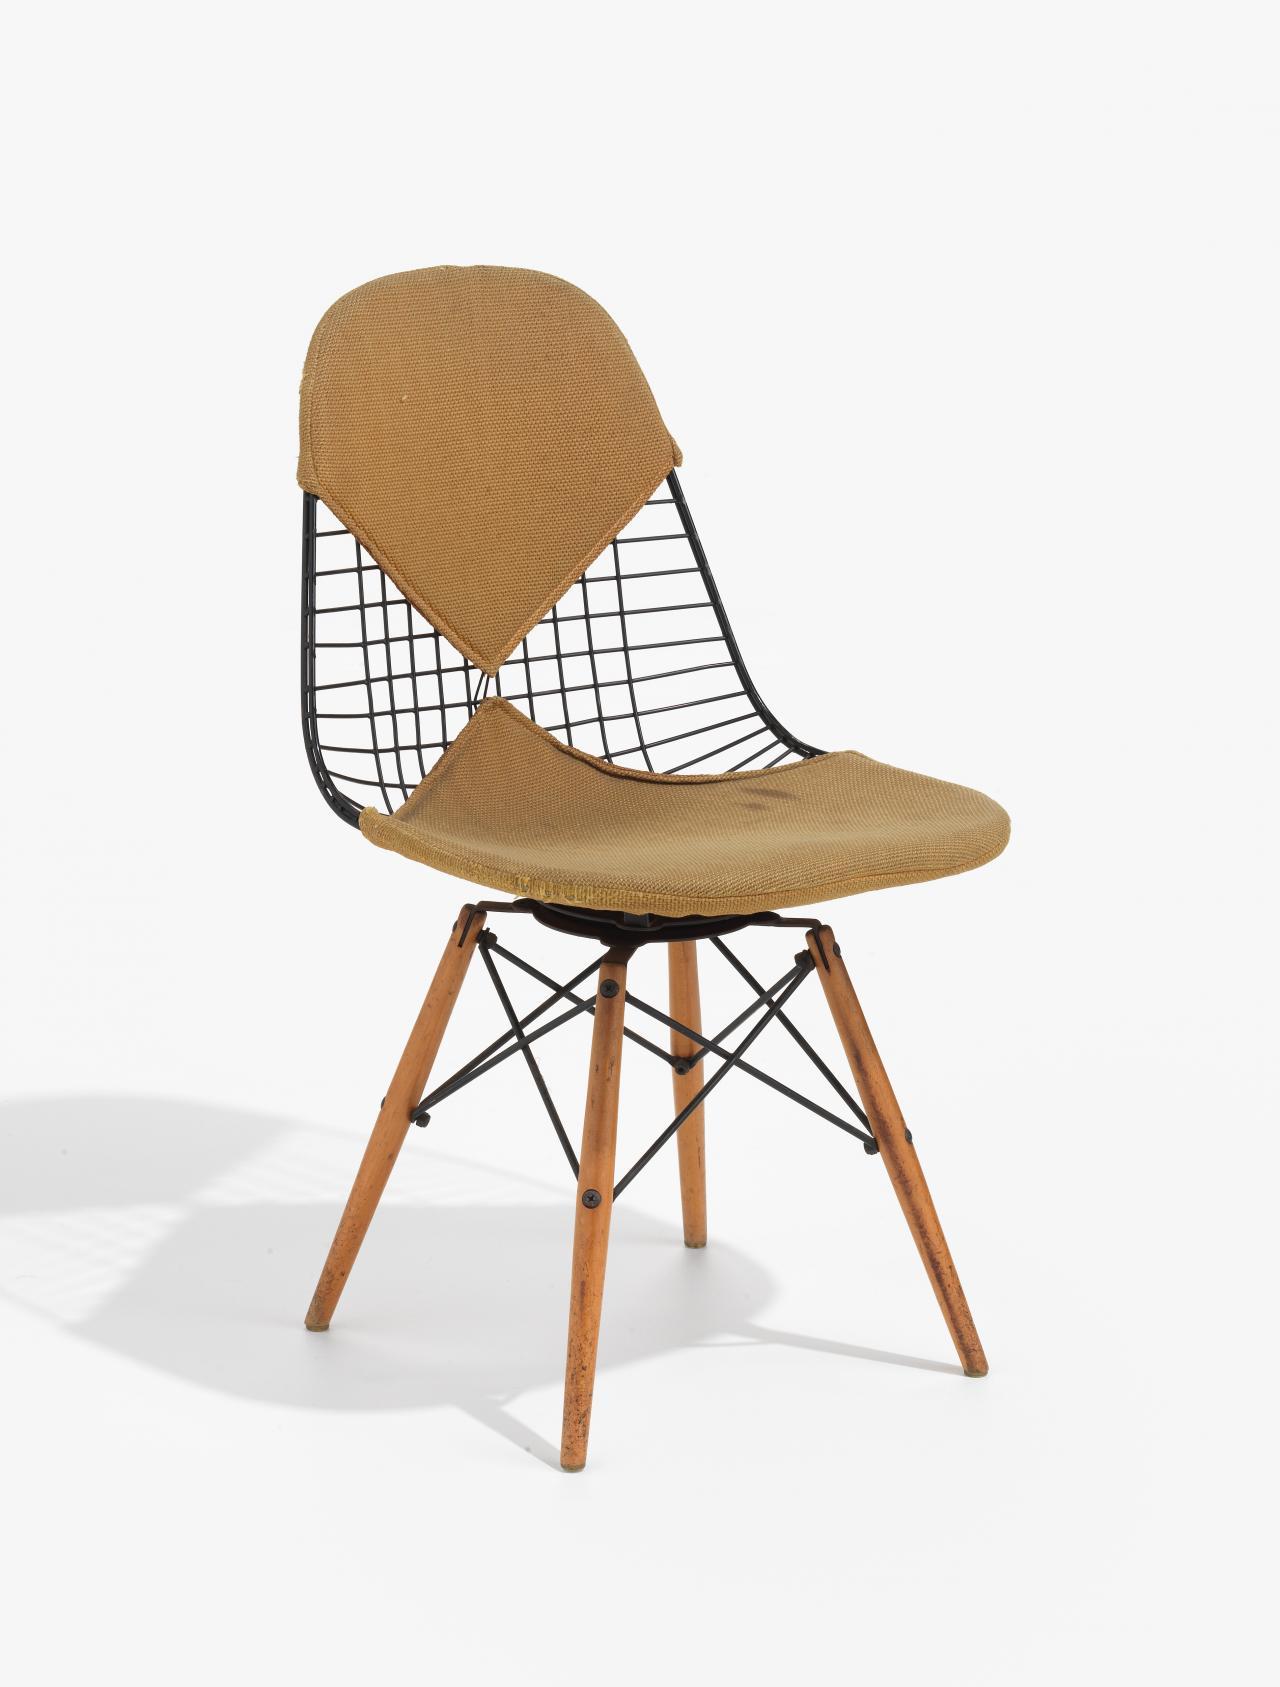 Wire Mesh Chair Charles Eames Designer Ray Eames Designer Herman Miller Michigan Manufacturer Ngv View Work